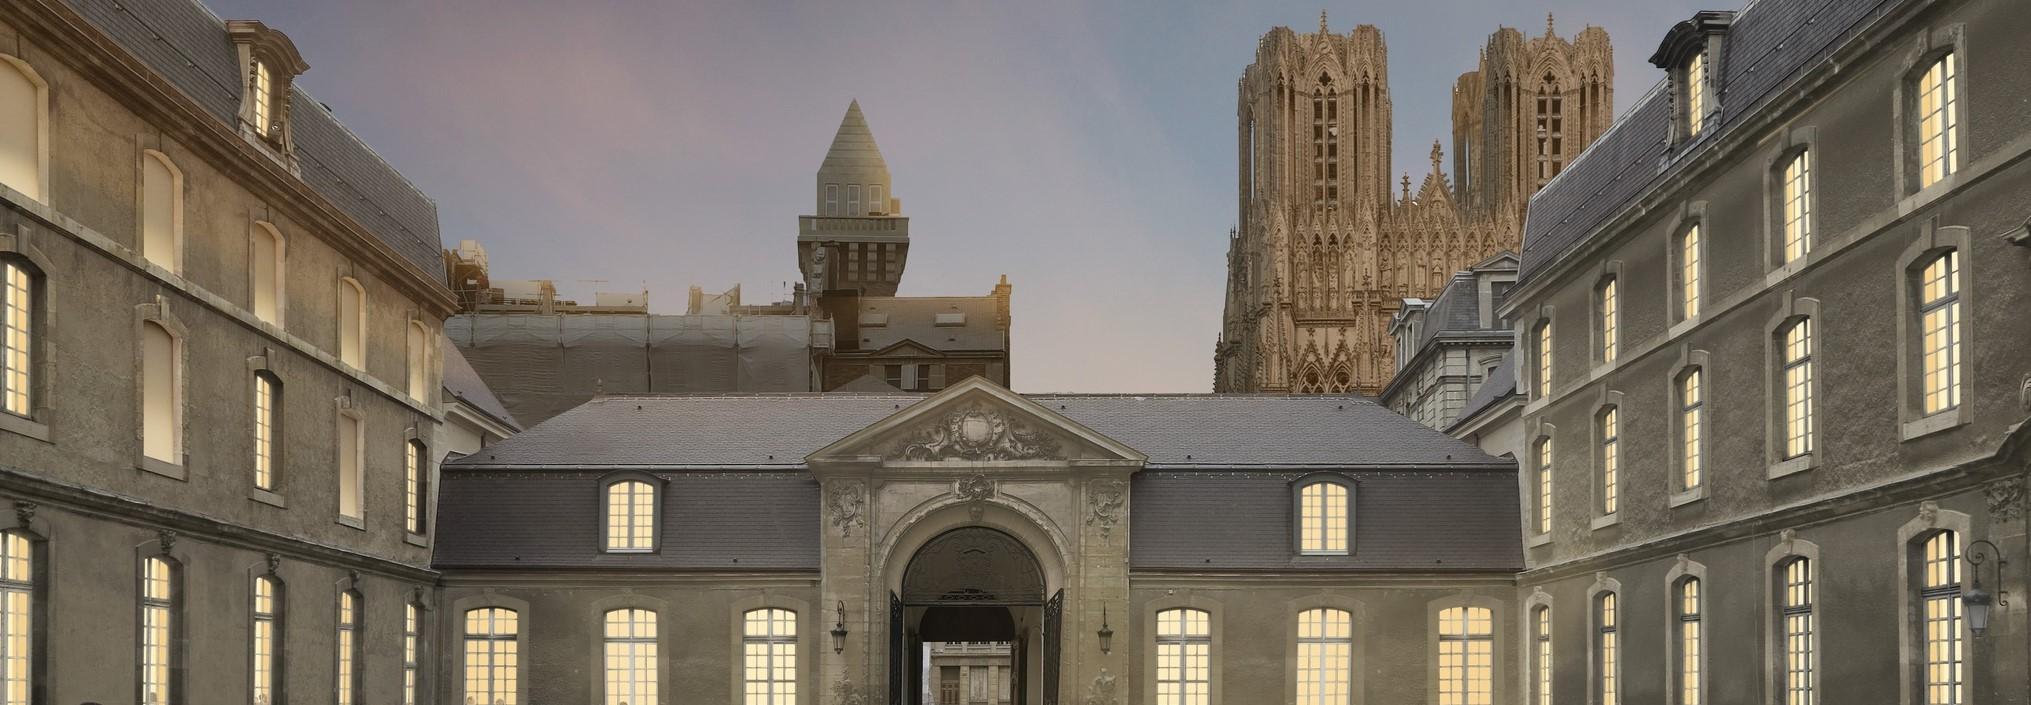 Museu de Belas-Artes de Reims, Aires Mateus